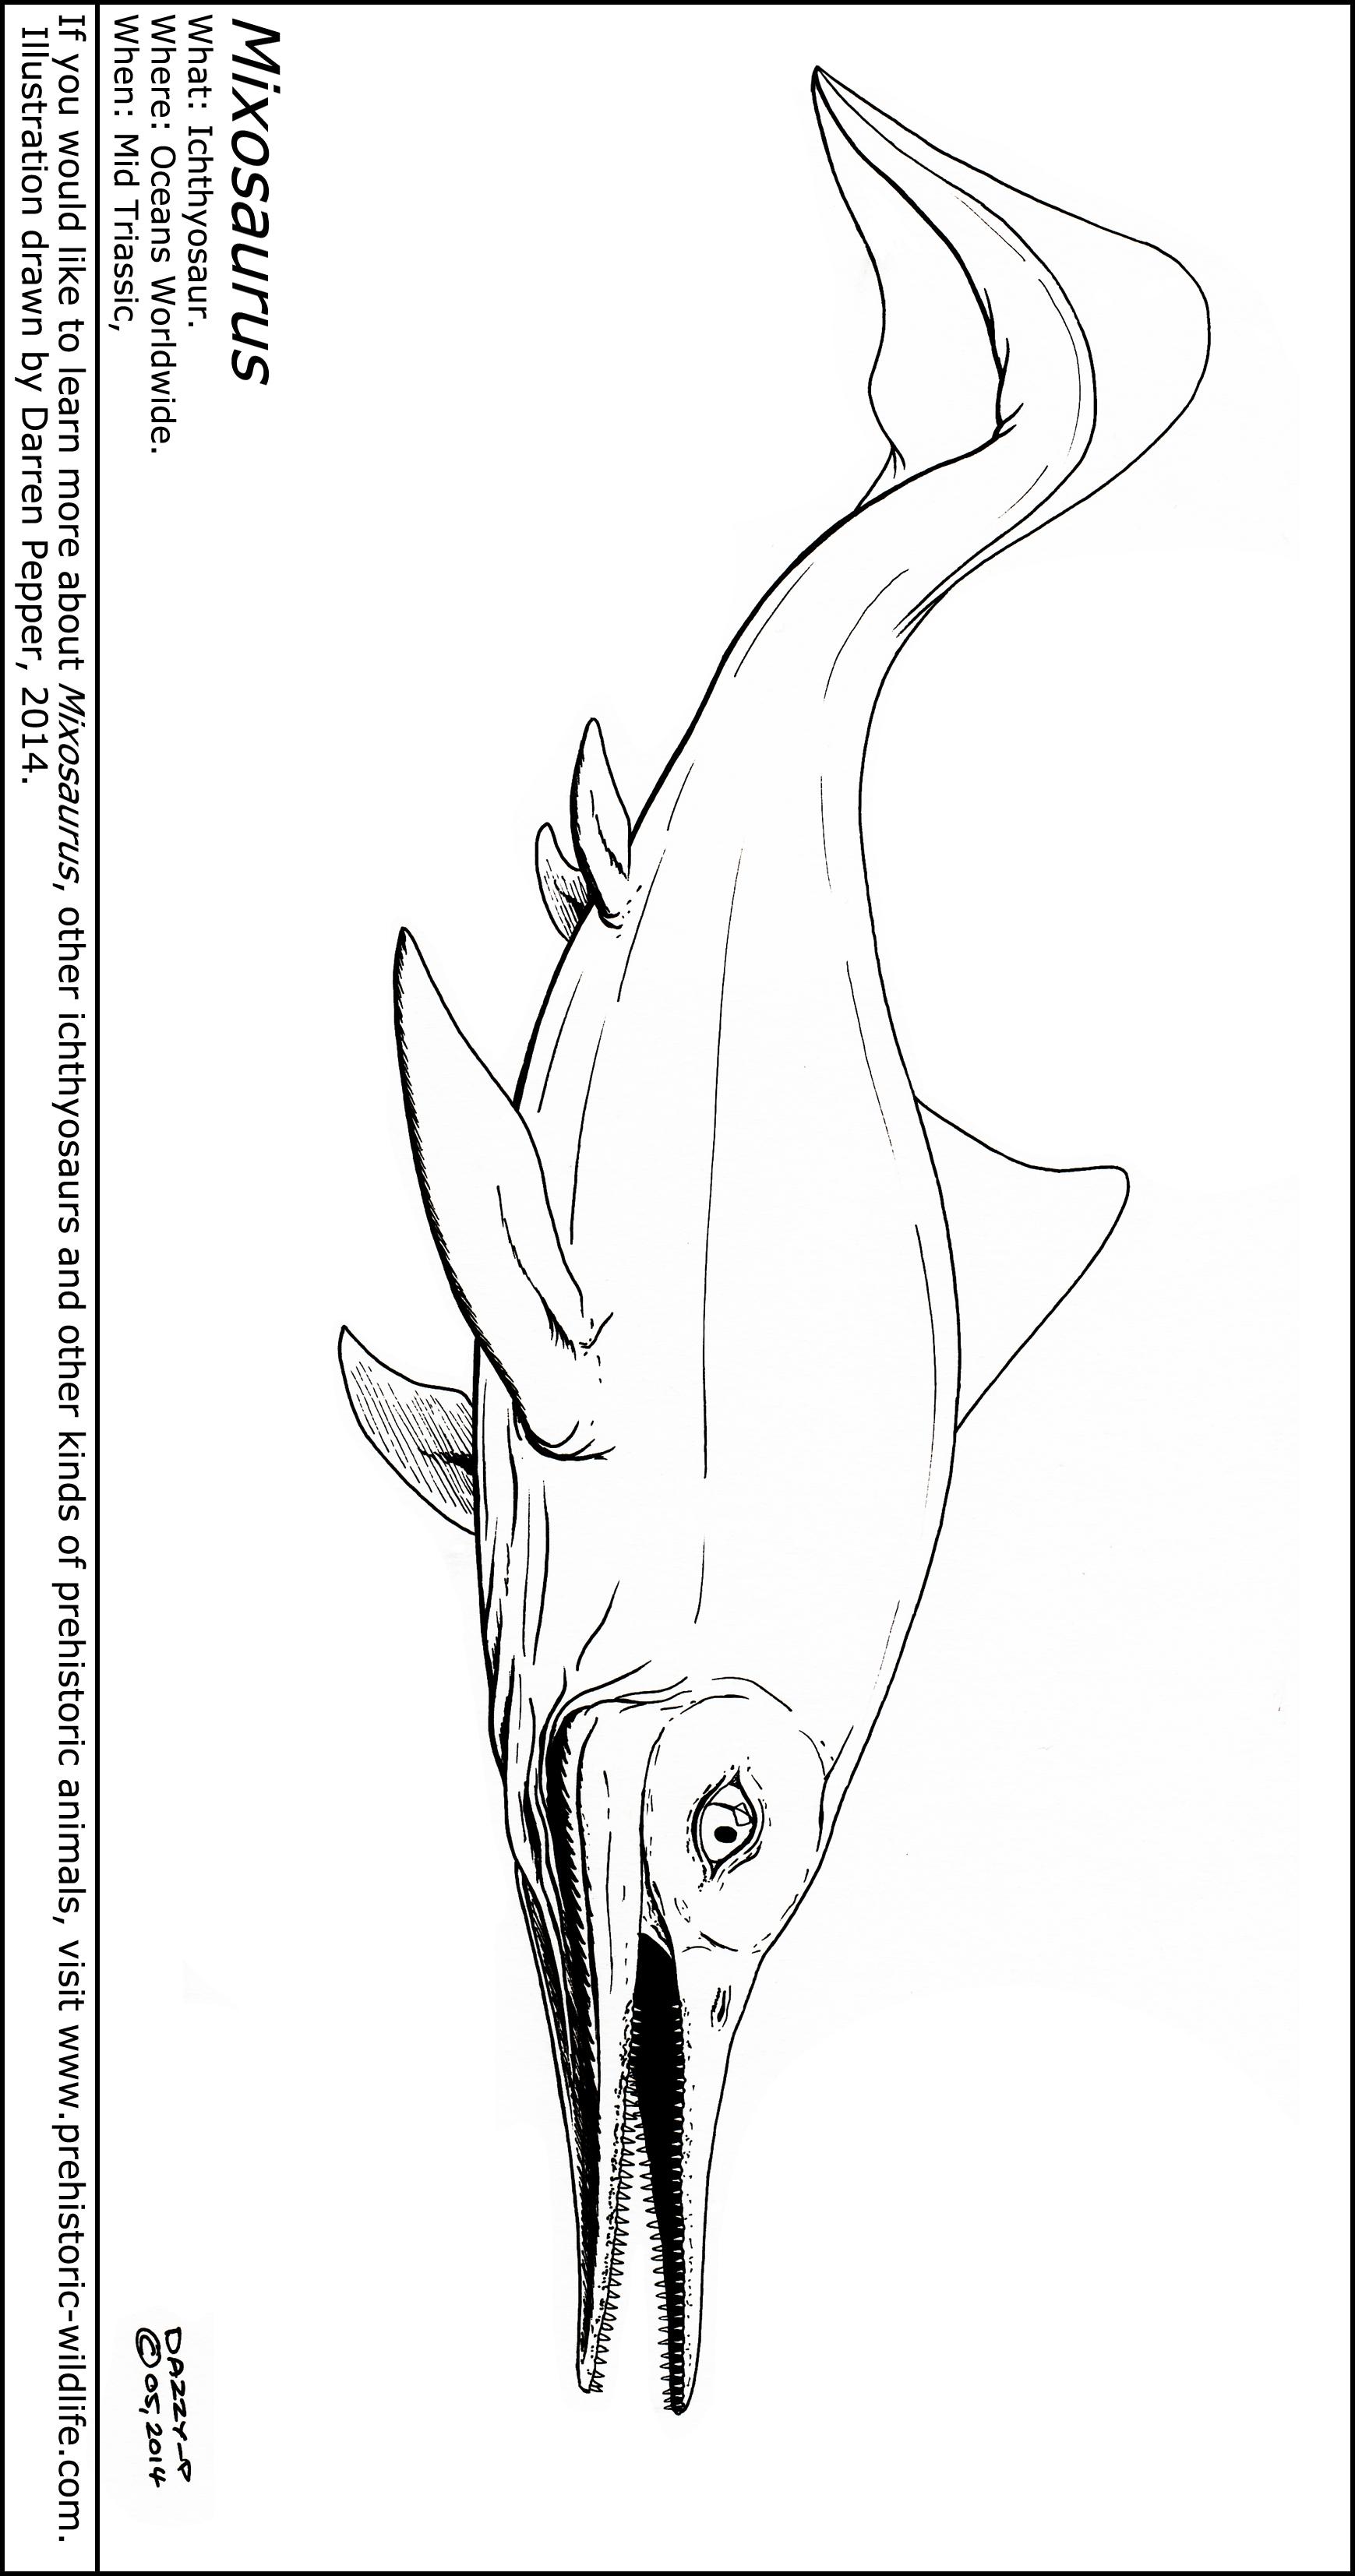 Ichthyosaurus Coloring Page - Ankylosaurus Stock Images ... Ichthyosaurus Coloring Page